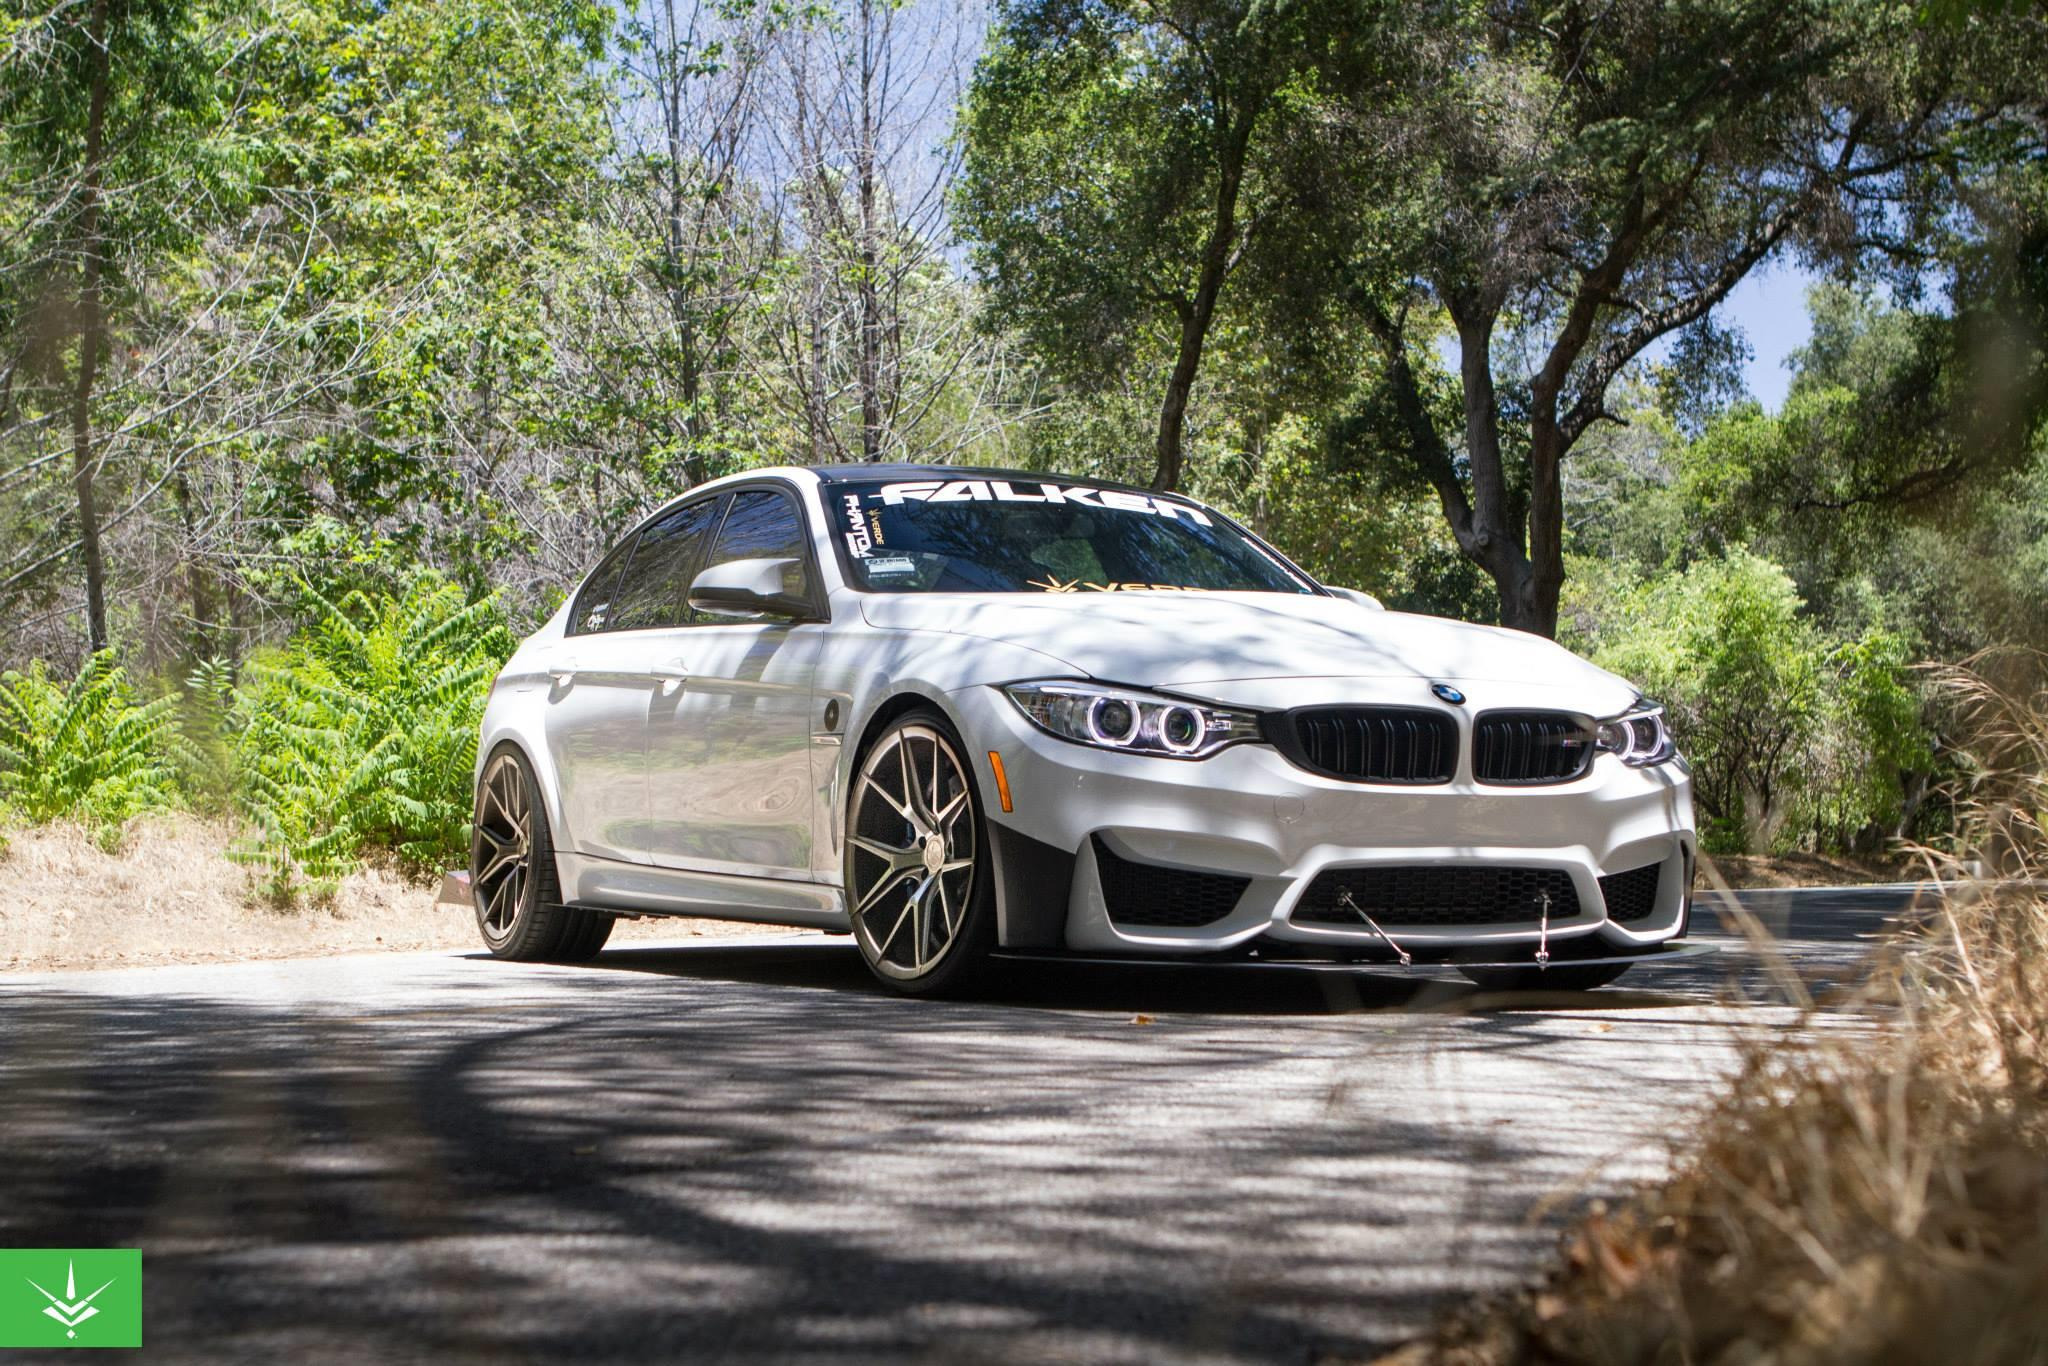 BMW - M3 - 2015 - Wheels & Tires